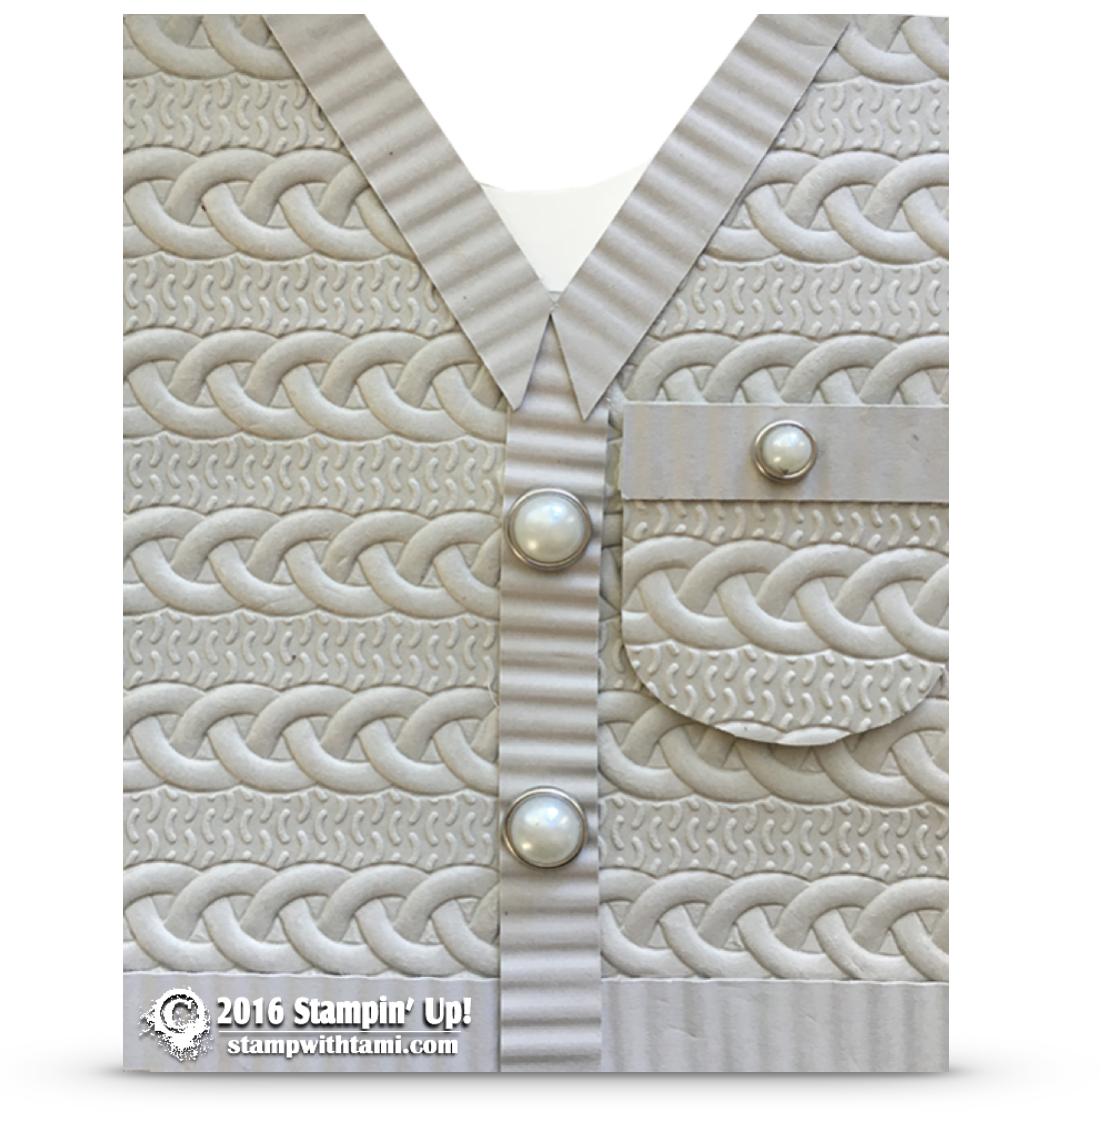 stmapin up holiday catalog cable knit dynamic folder